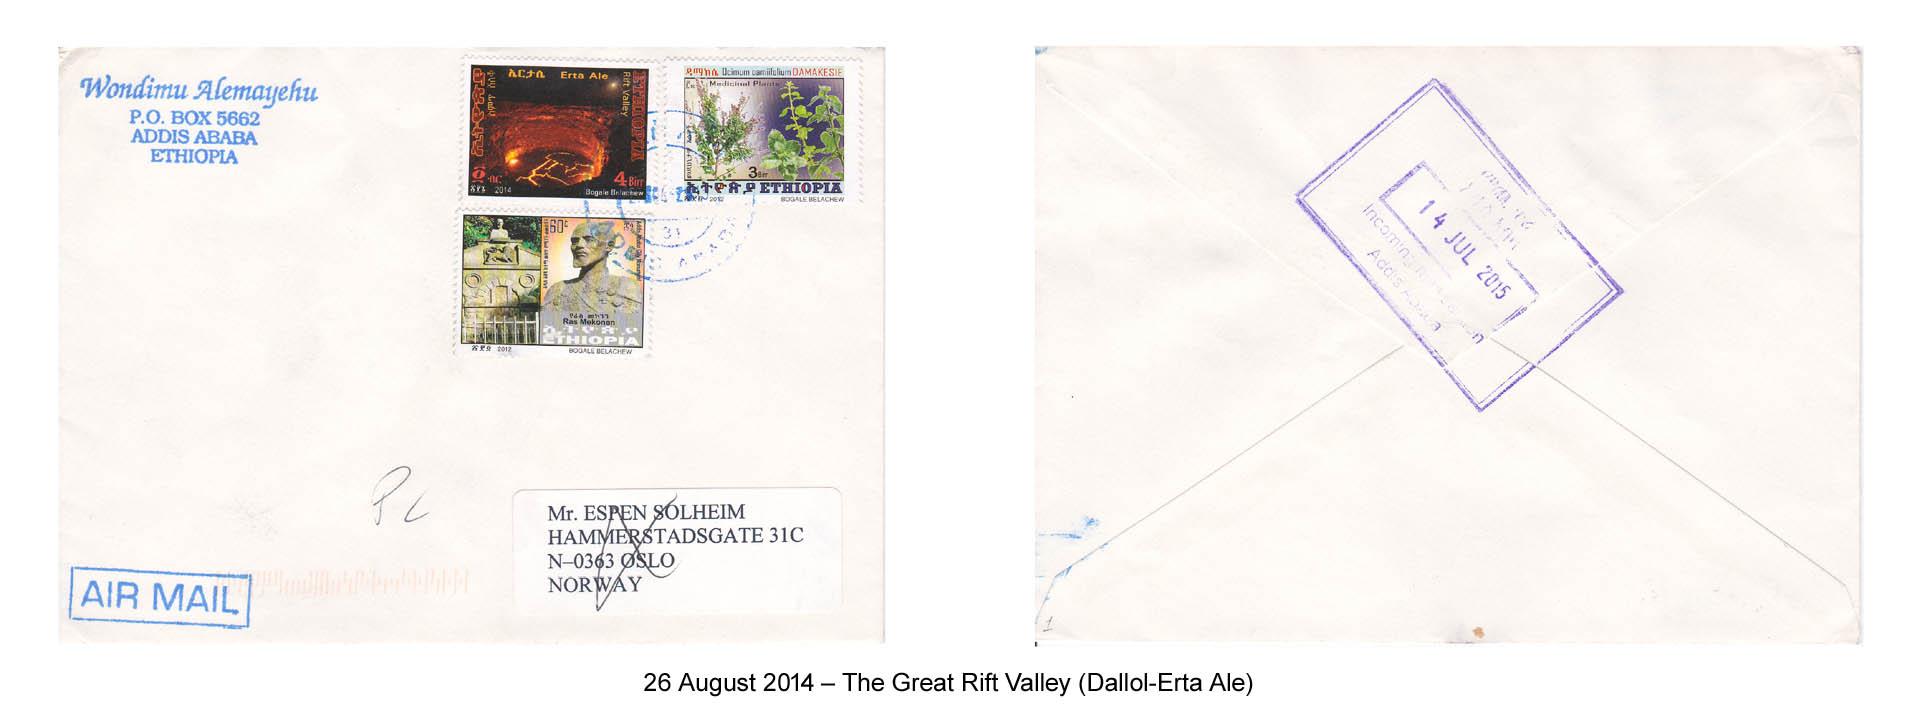 20140826 – The Great Rift Valley (Dallol-Erta Ale)